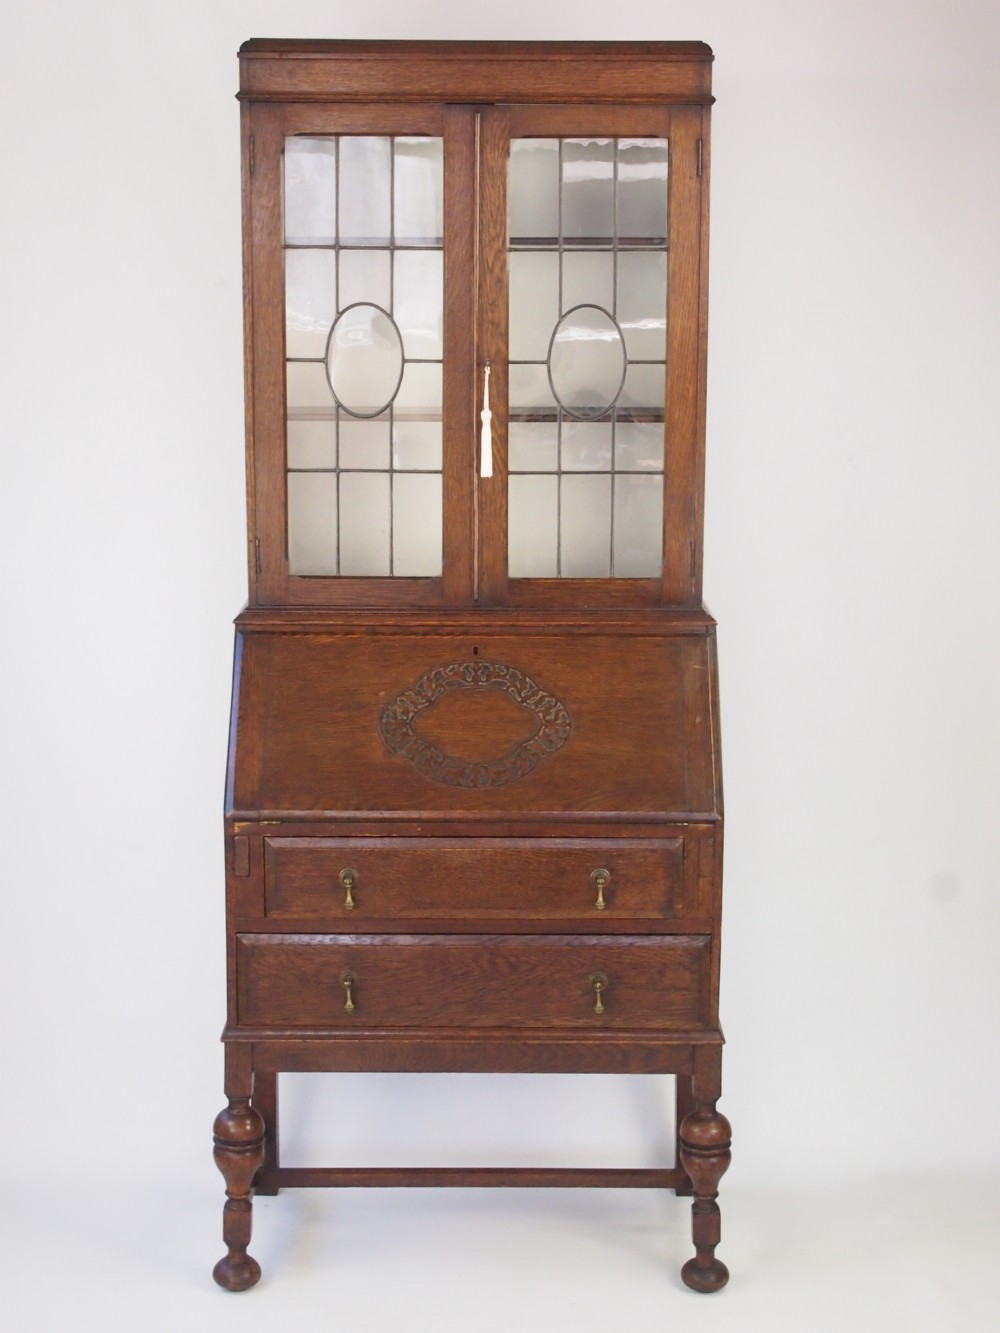 Vintage Oak Bureau Bookcase Writing Desk 286164